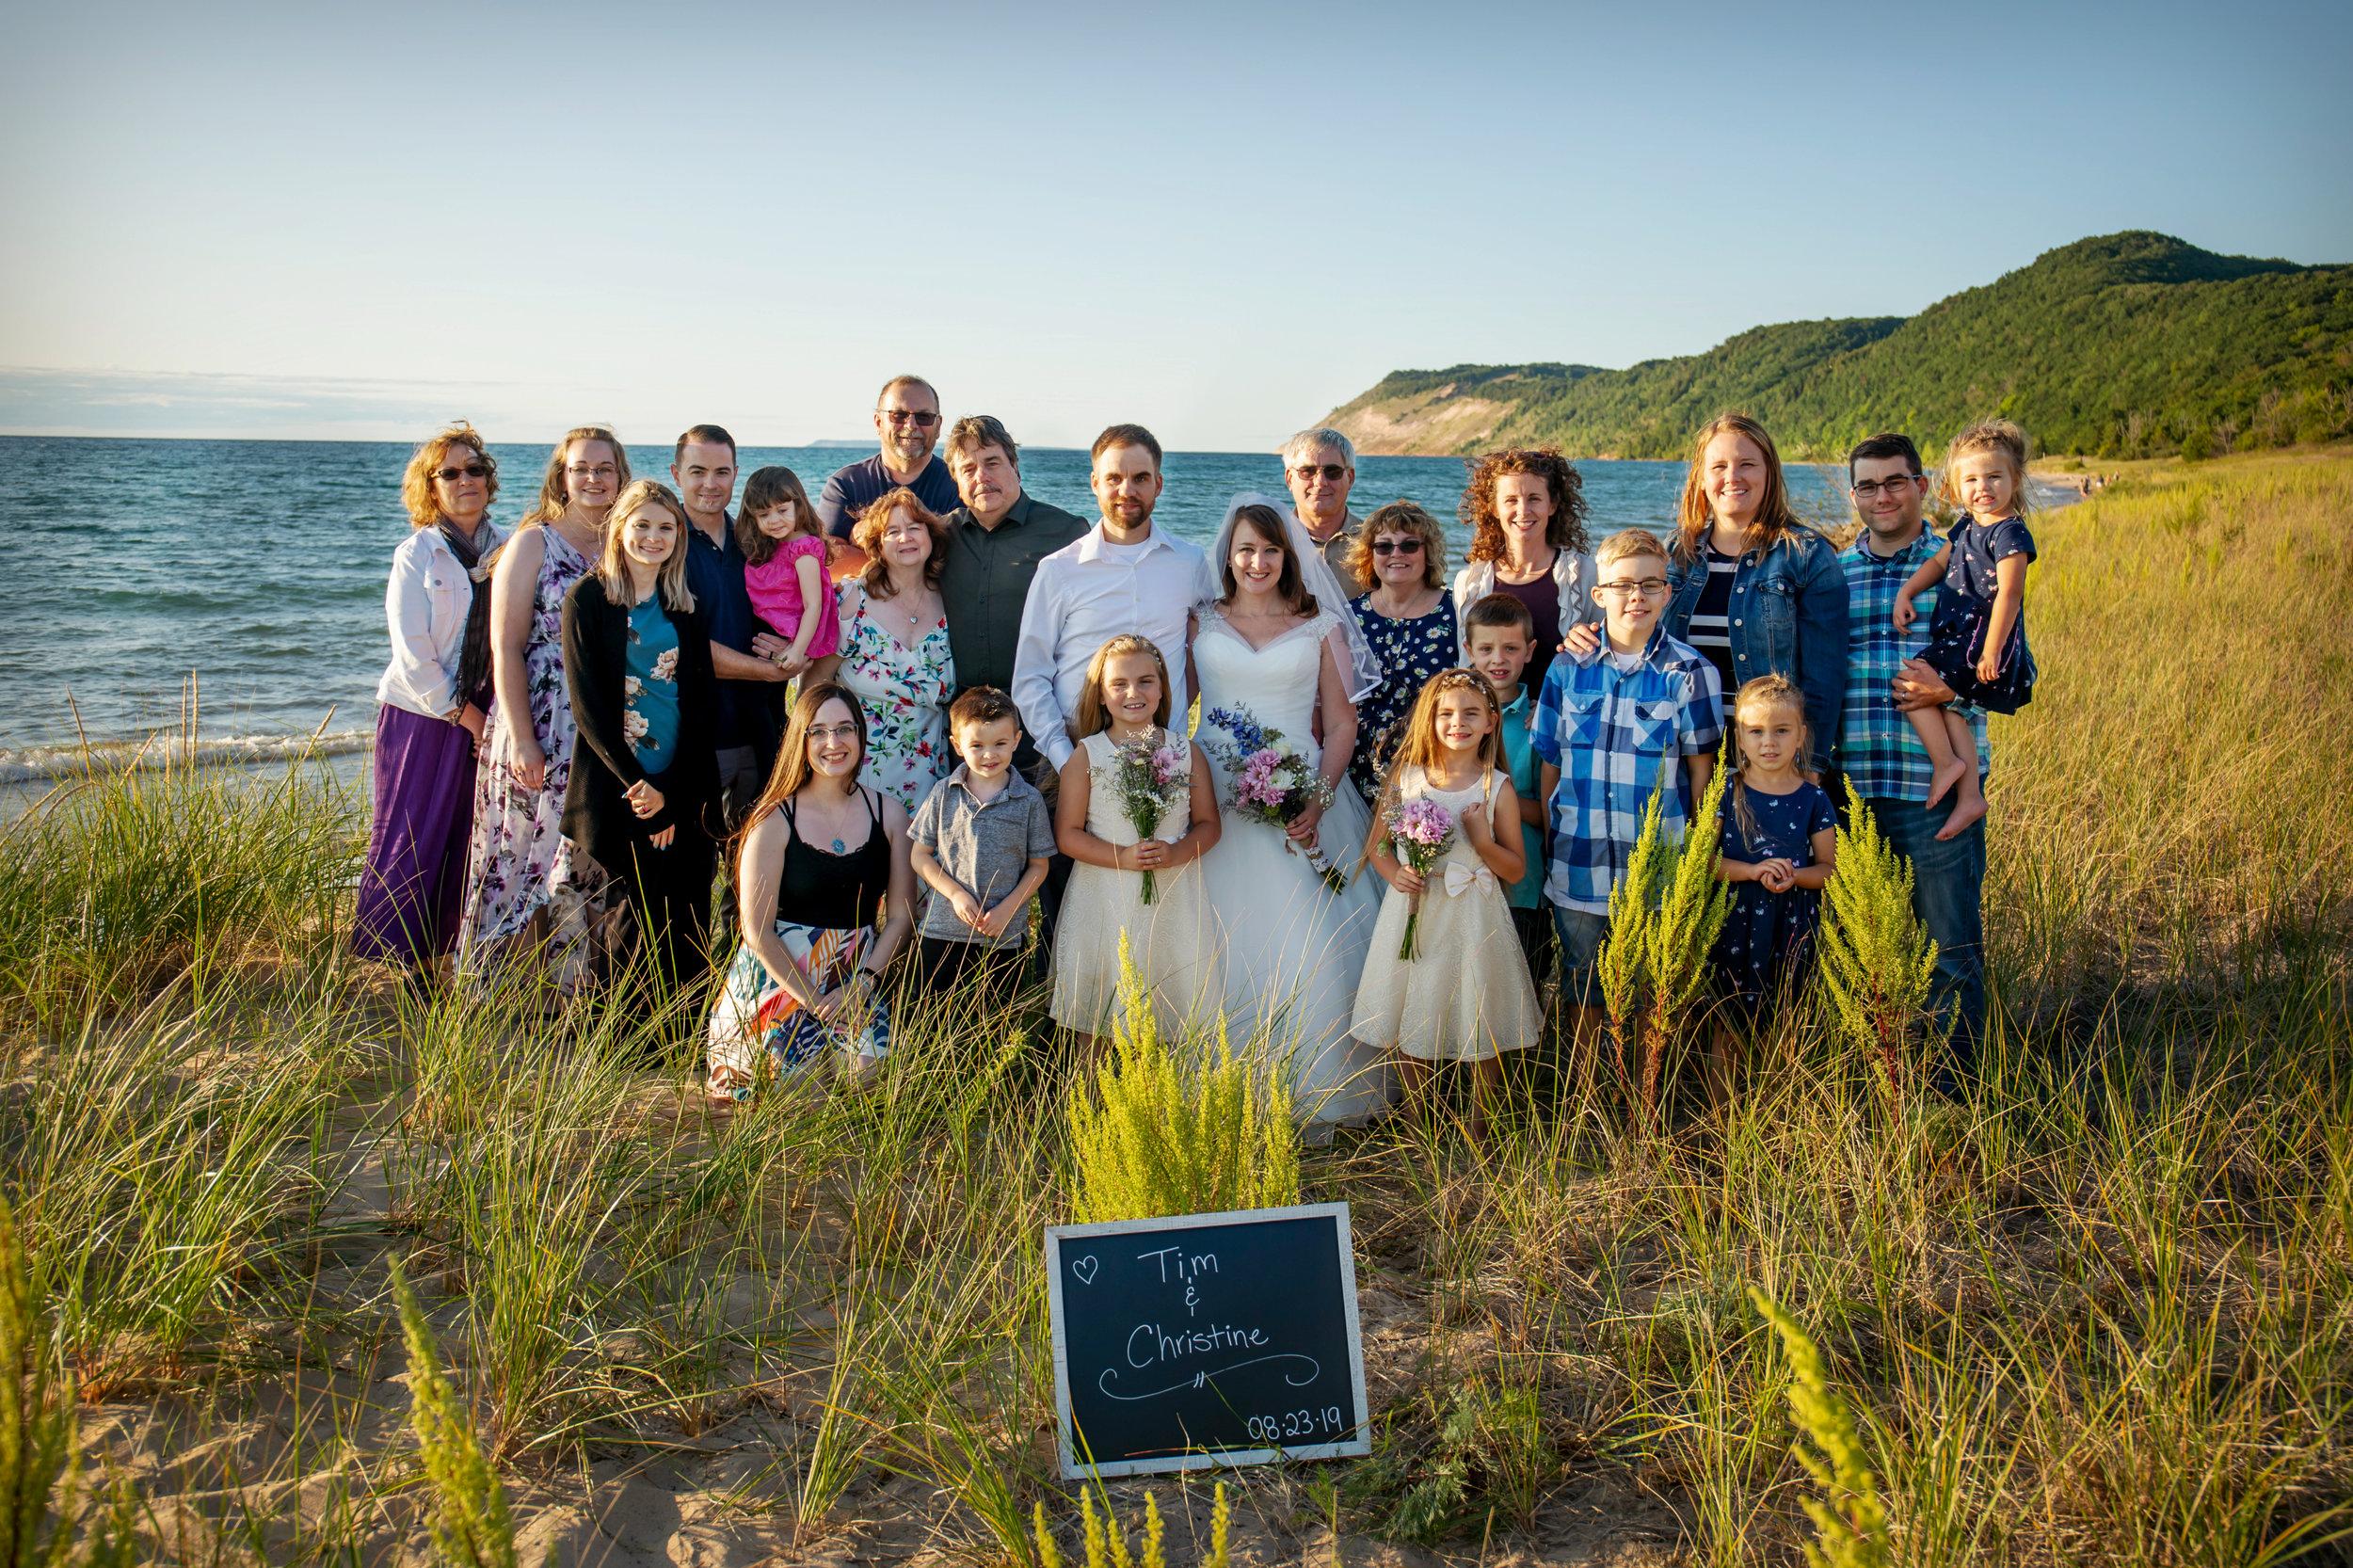 Riley Wedding 8.23.2019 Honor, Michigan.